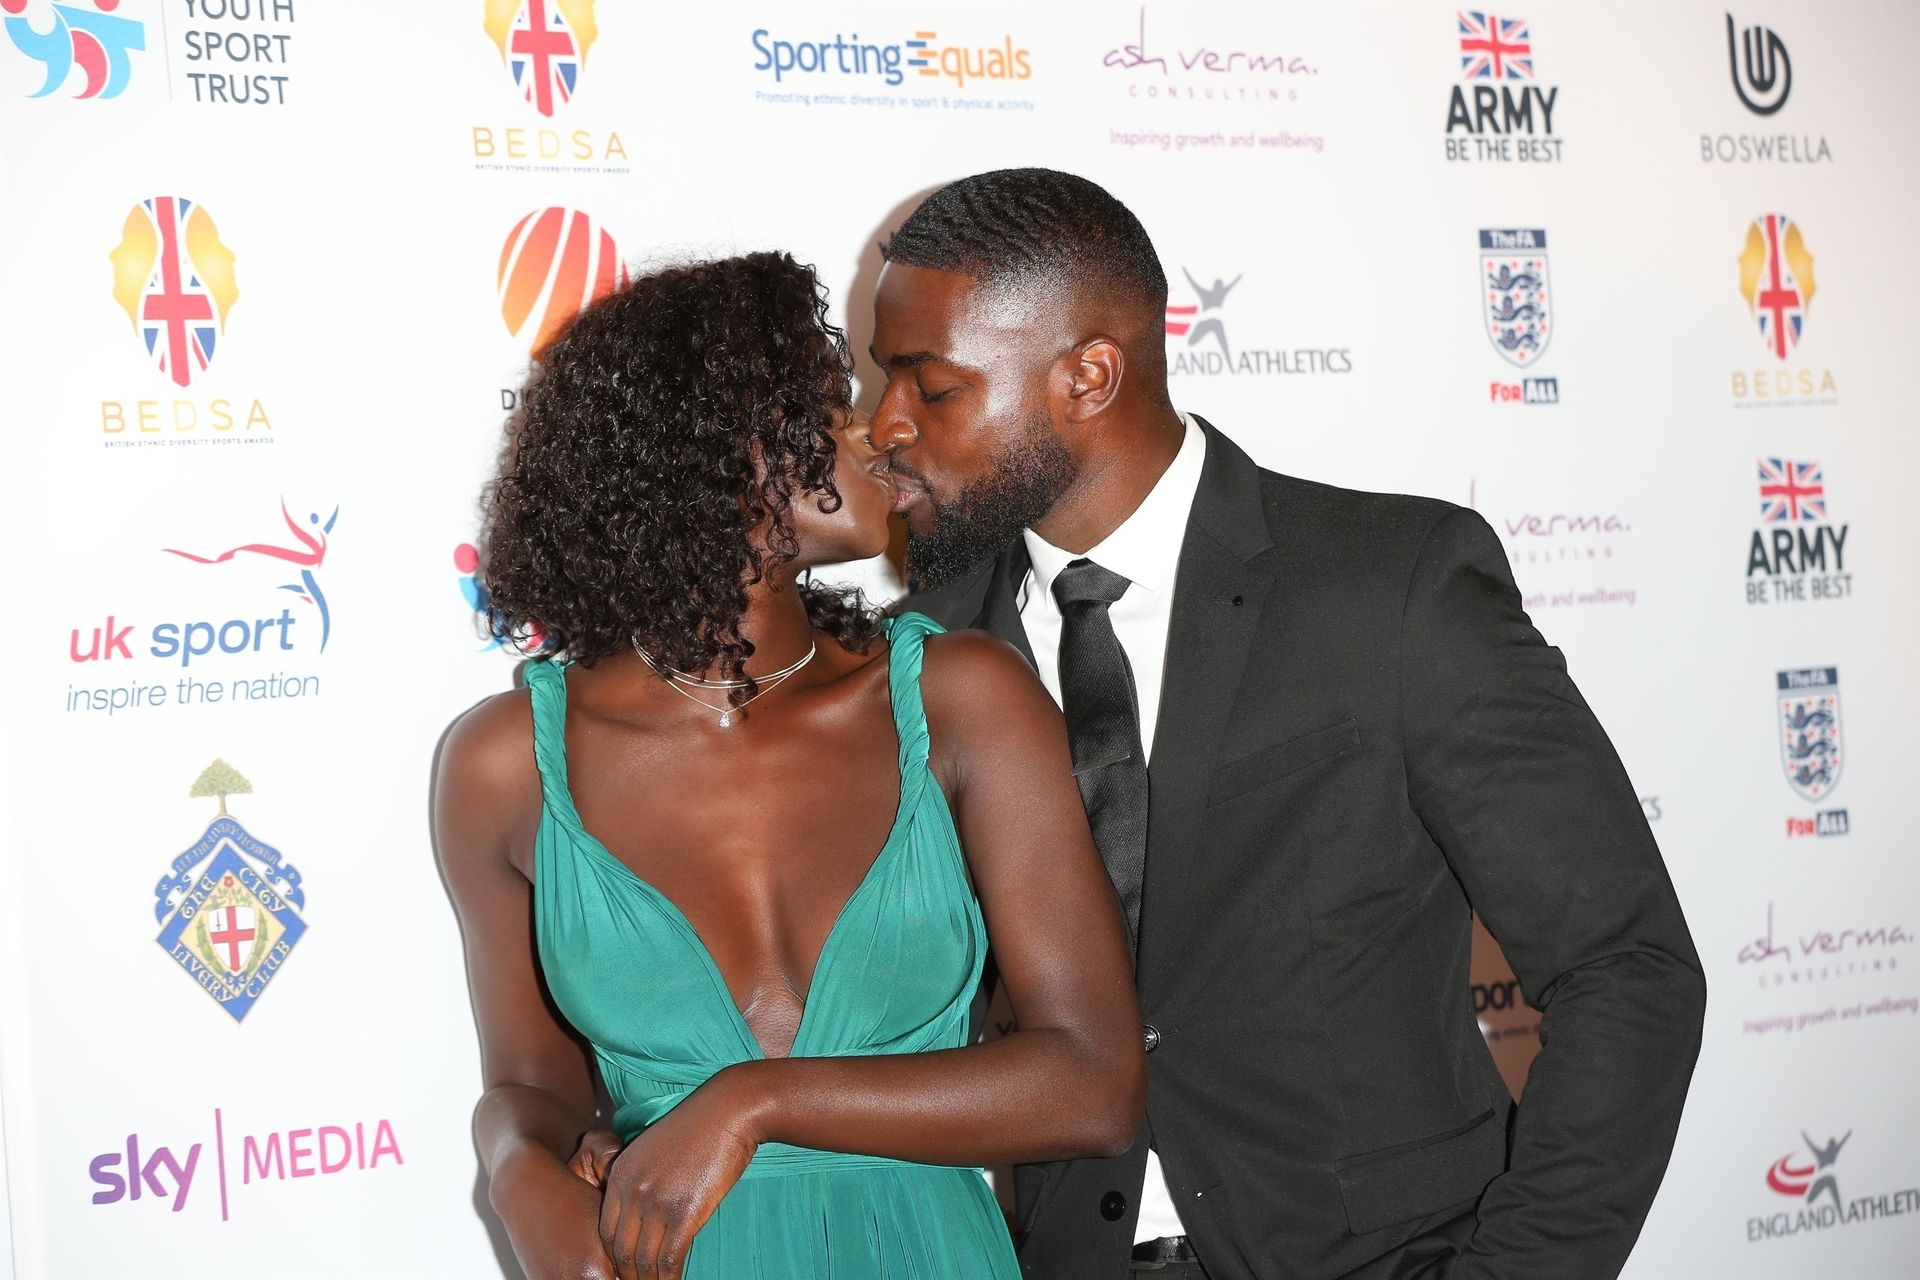 Mike Boateng & Priscilla Anyabu Are Seen At British Ethnic Diversity Sports Awards 0062